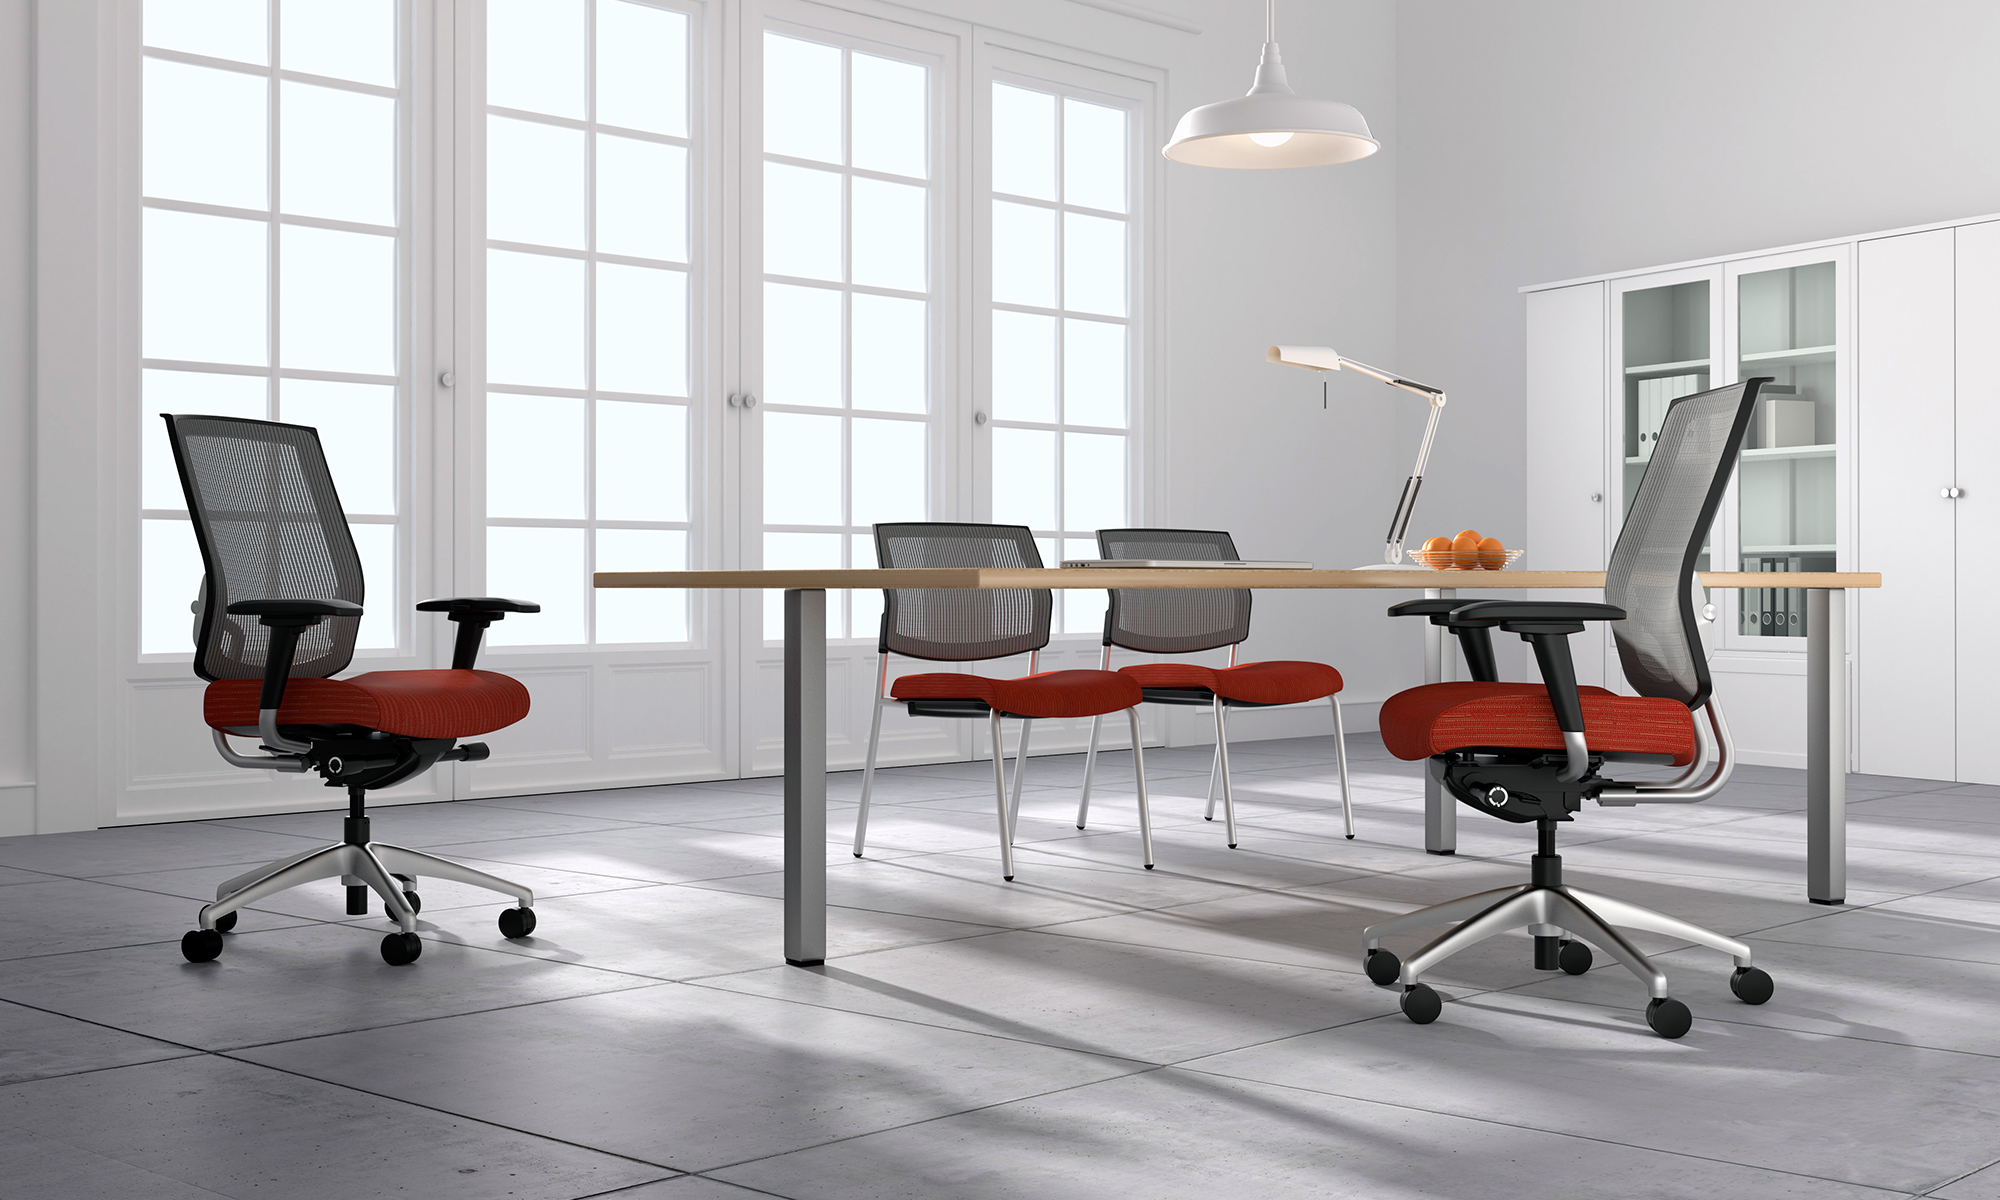 focus_sport_managers_office_environment.jpg